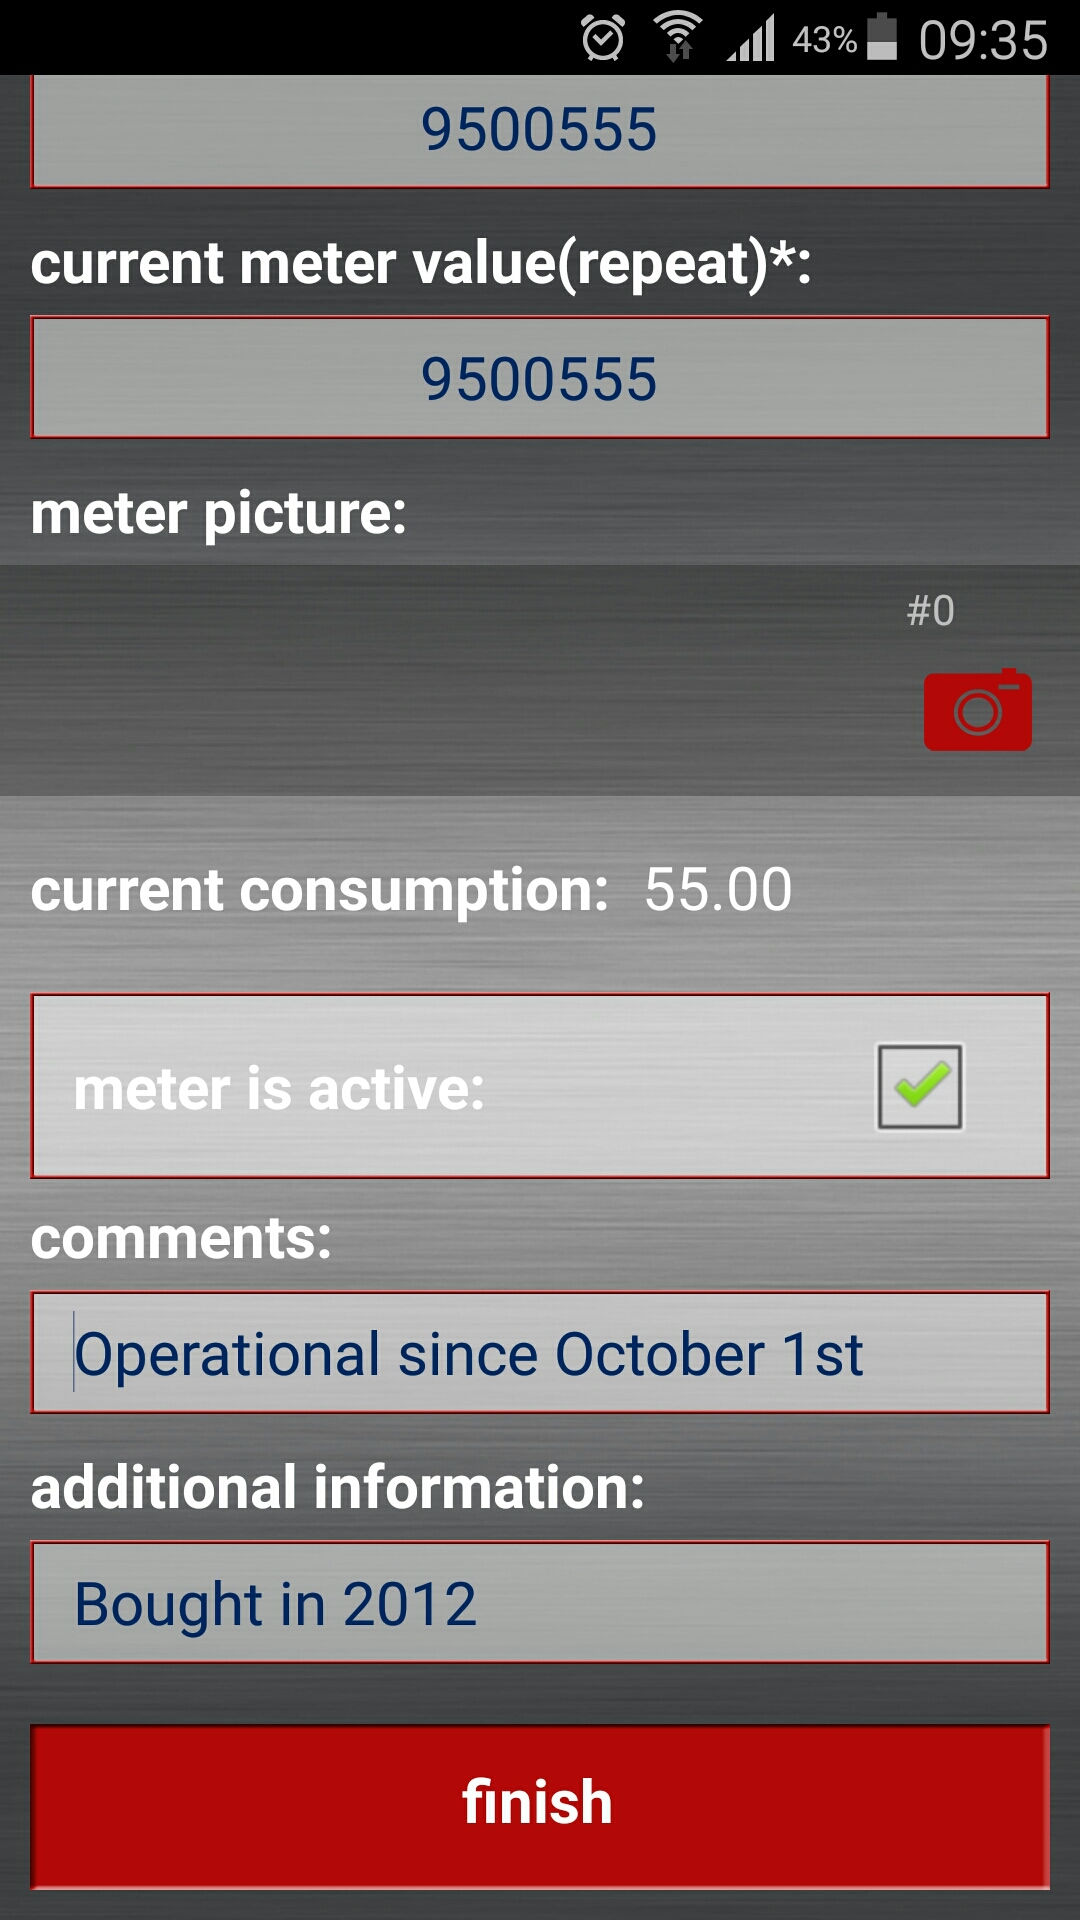 ginstr_app_electricMeterCabinetReading_EN-10